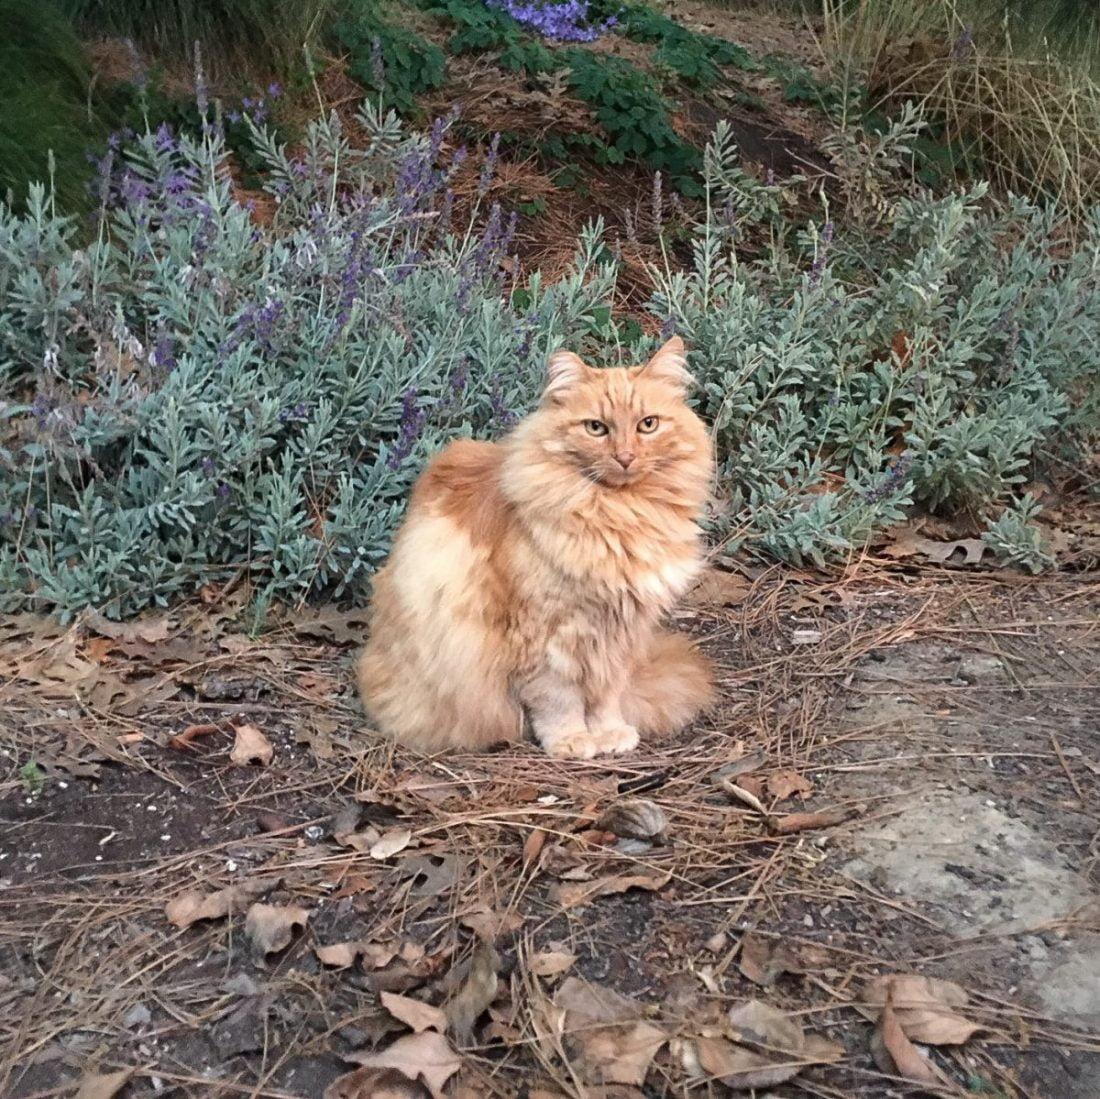 Nutmeg, a favorite Disneyland cat